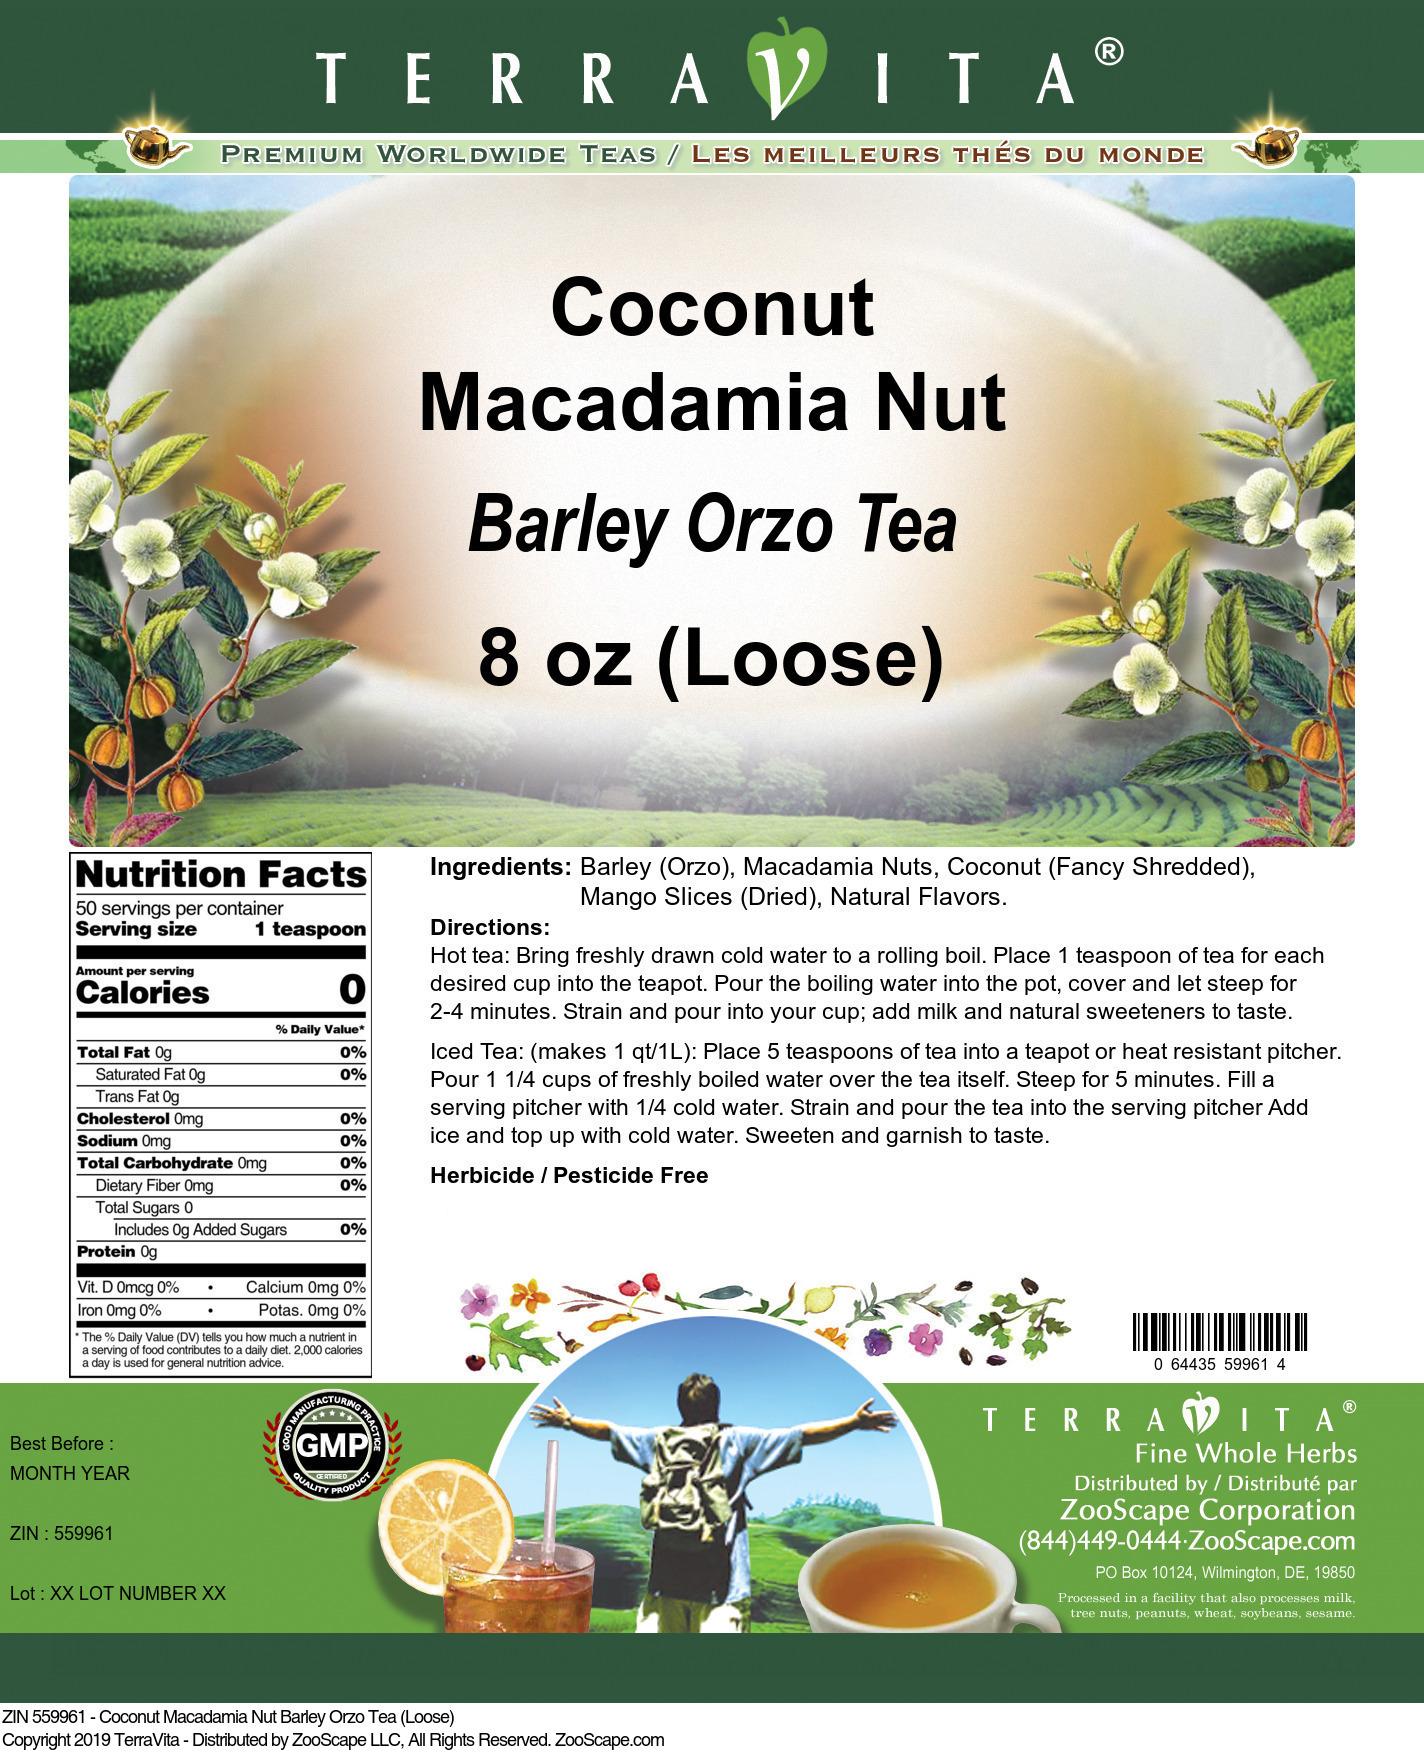 Coconut Macadamia Nut Barley Orzo